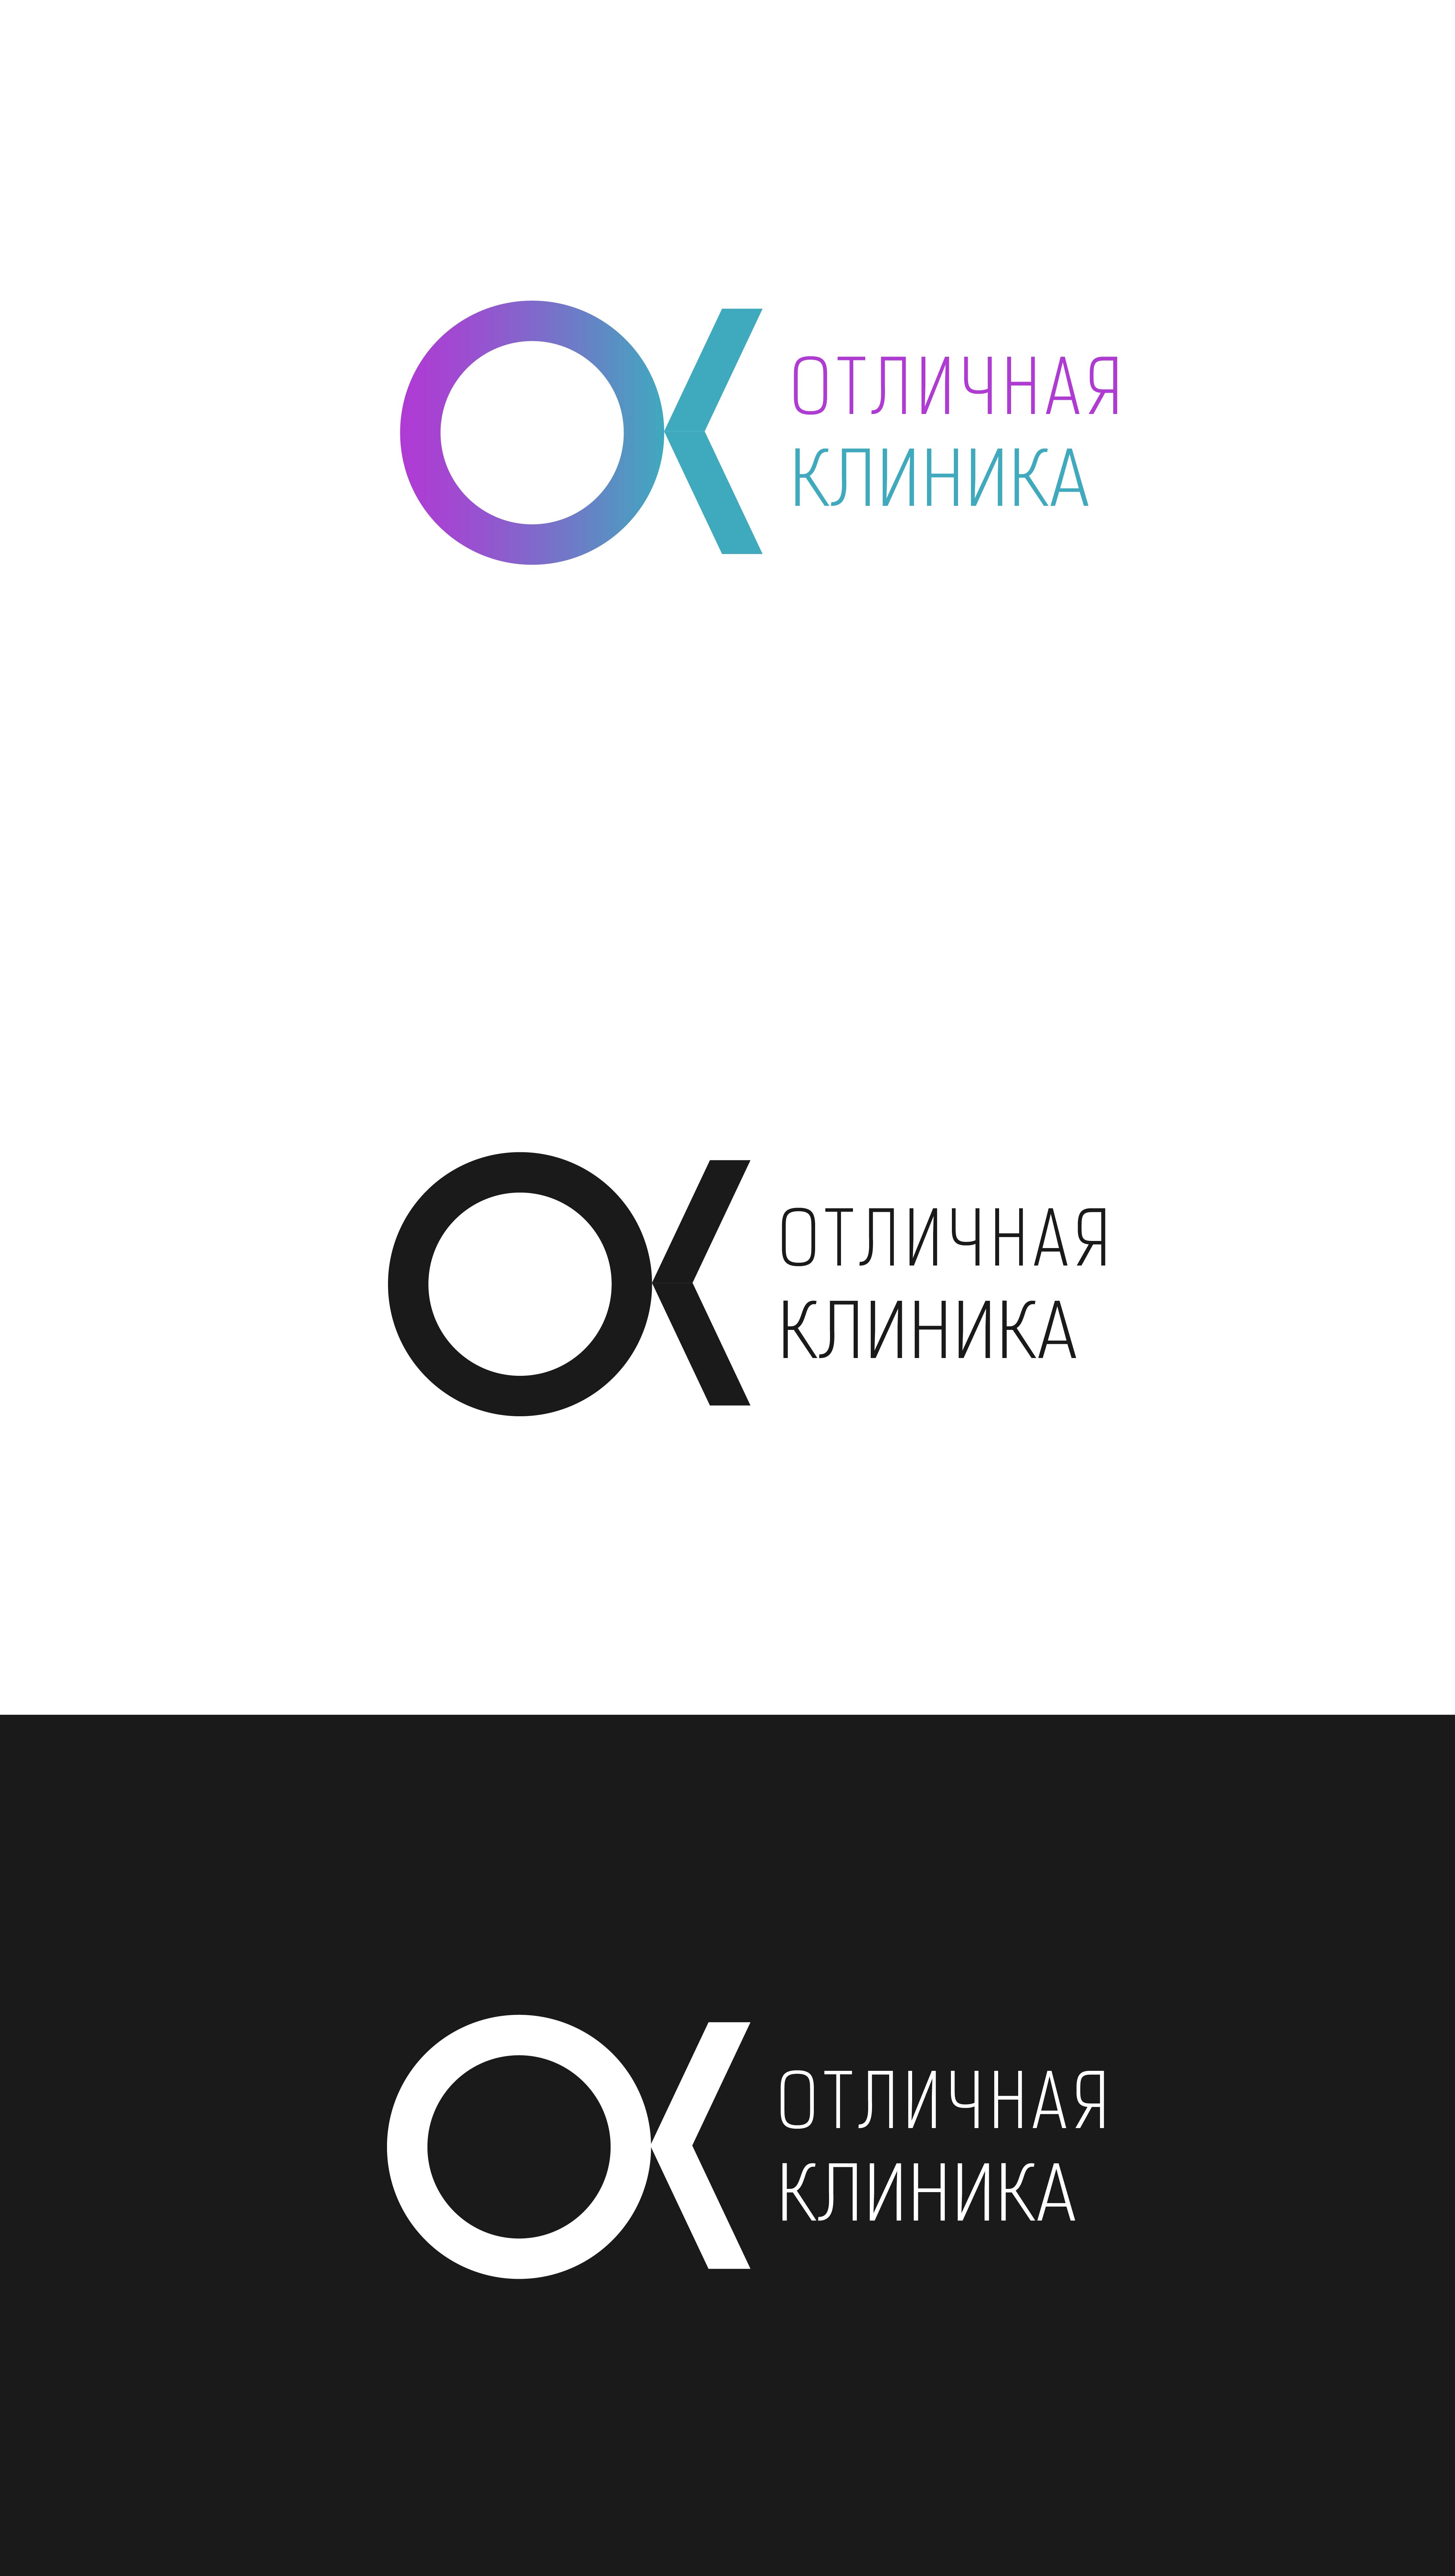 Логотип и фирменный стиль частной клиники фото f_4875c91592e1119a.png